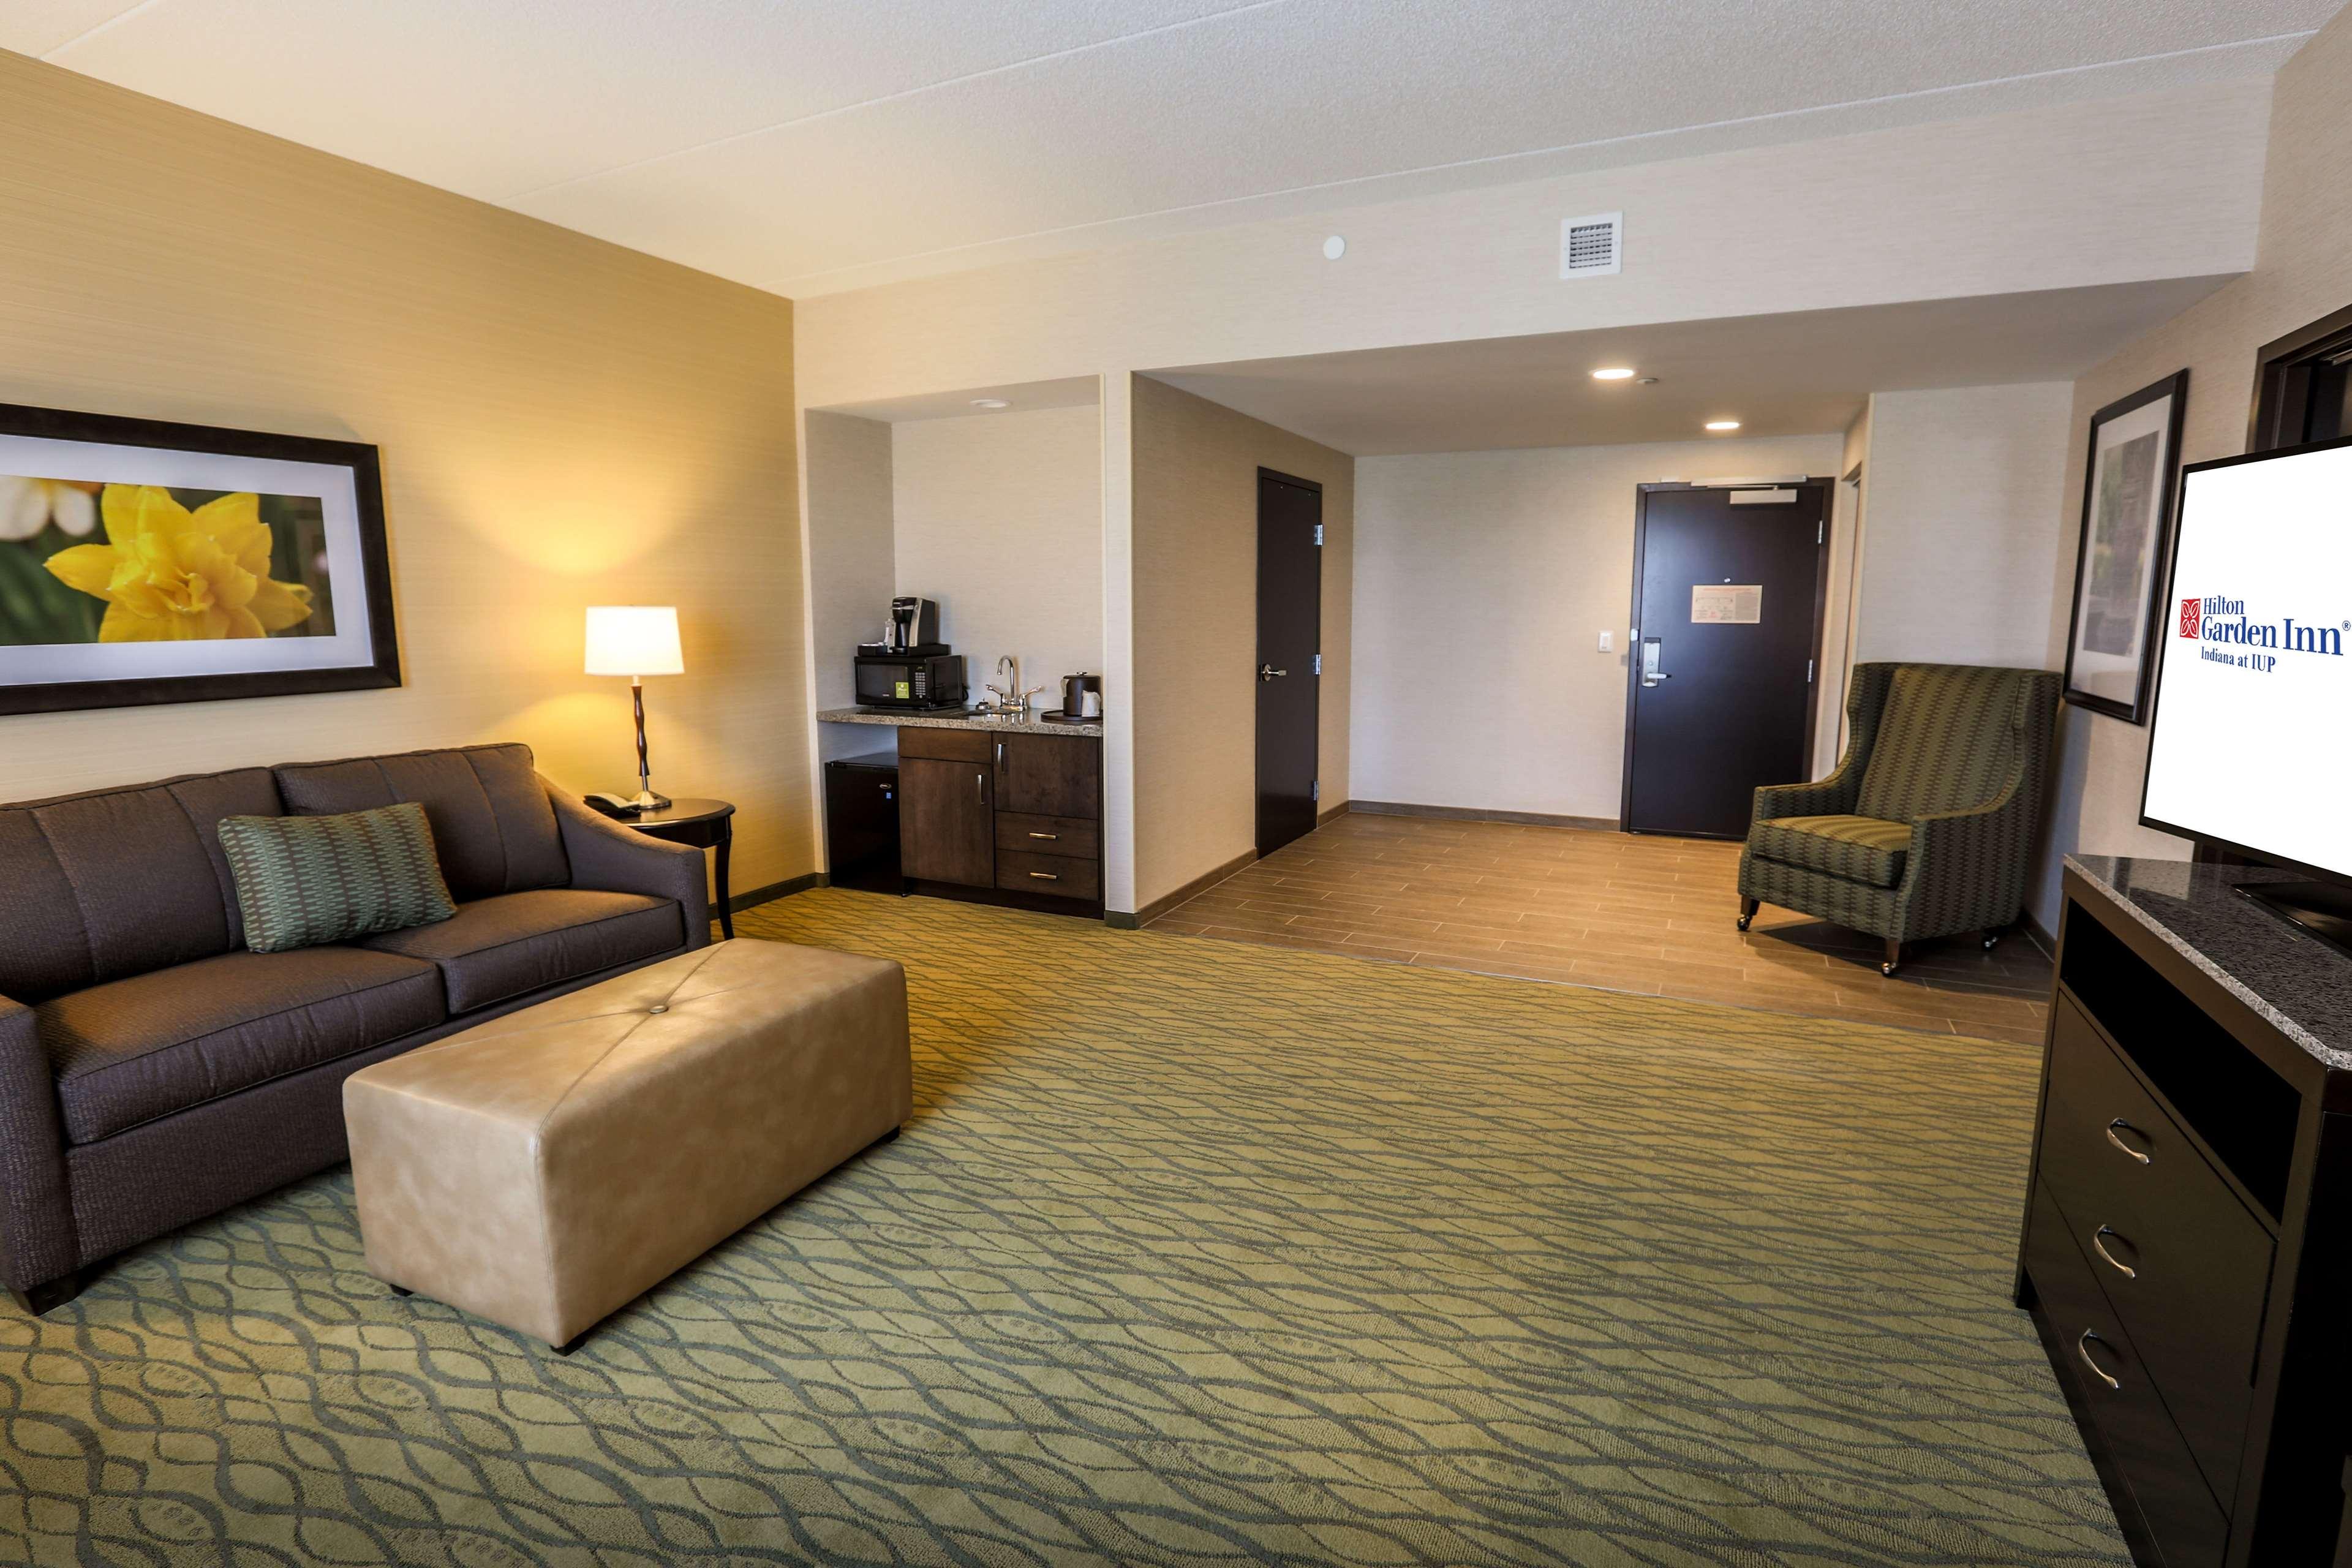 Hilton Garden Inn Indiana at IUP image 17